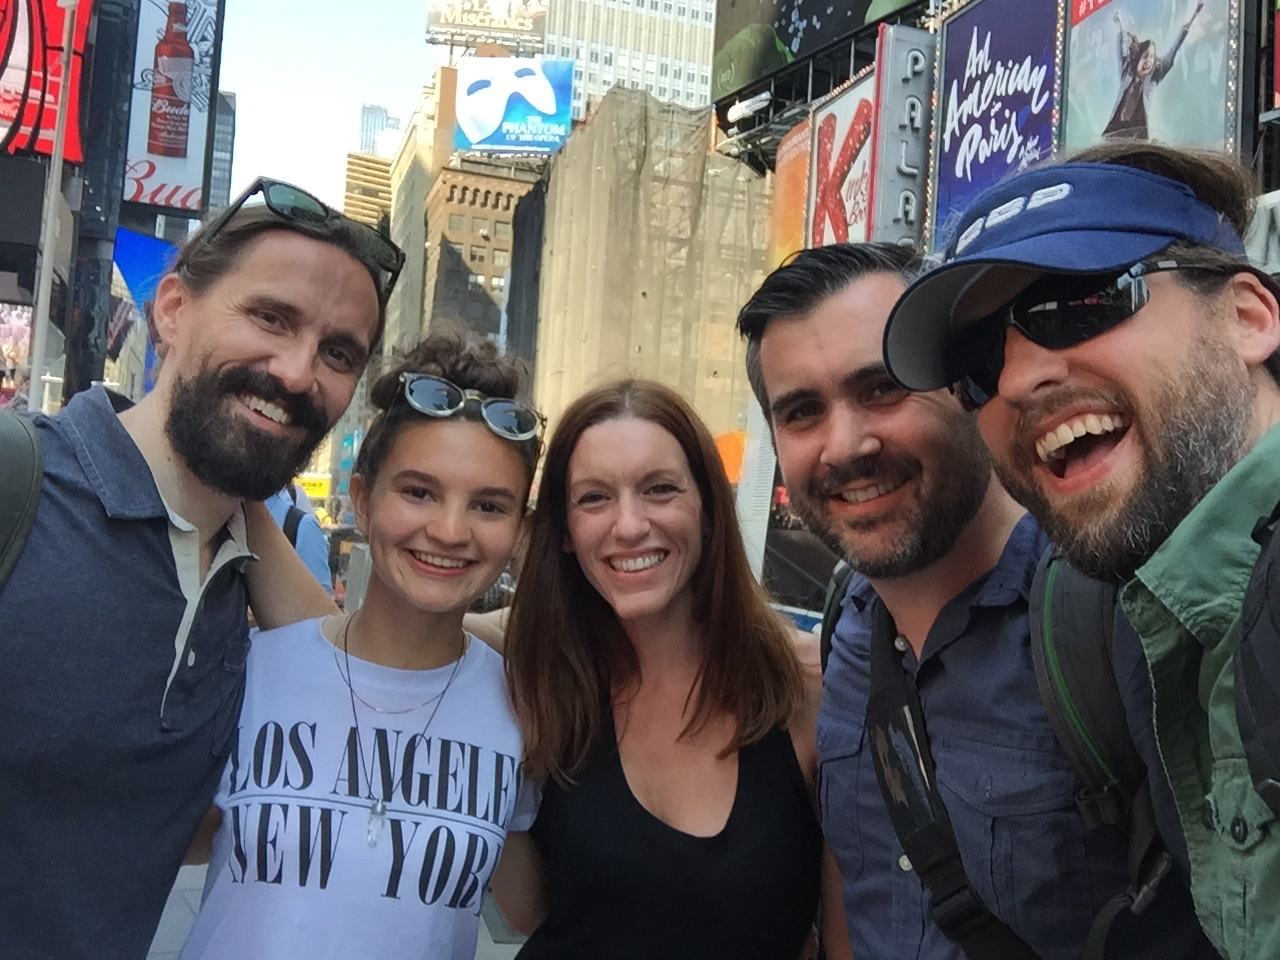 Spencer Clinton Parker, Zoe Rose, Amanda Lukoff, Danny Egan and Zac Halberd